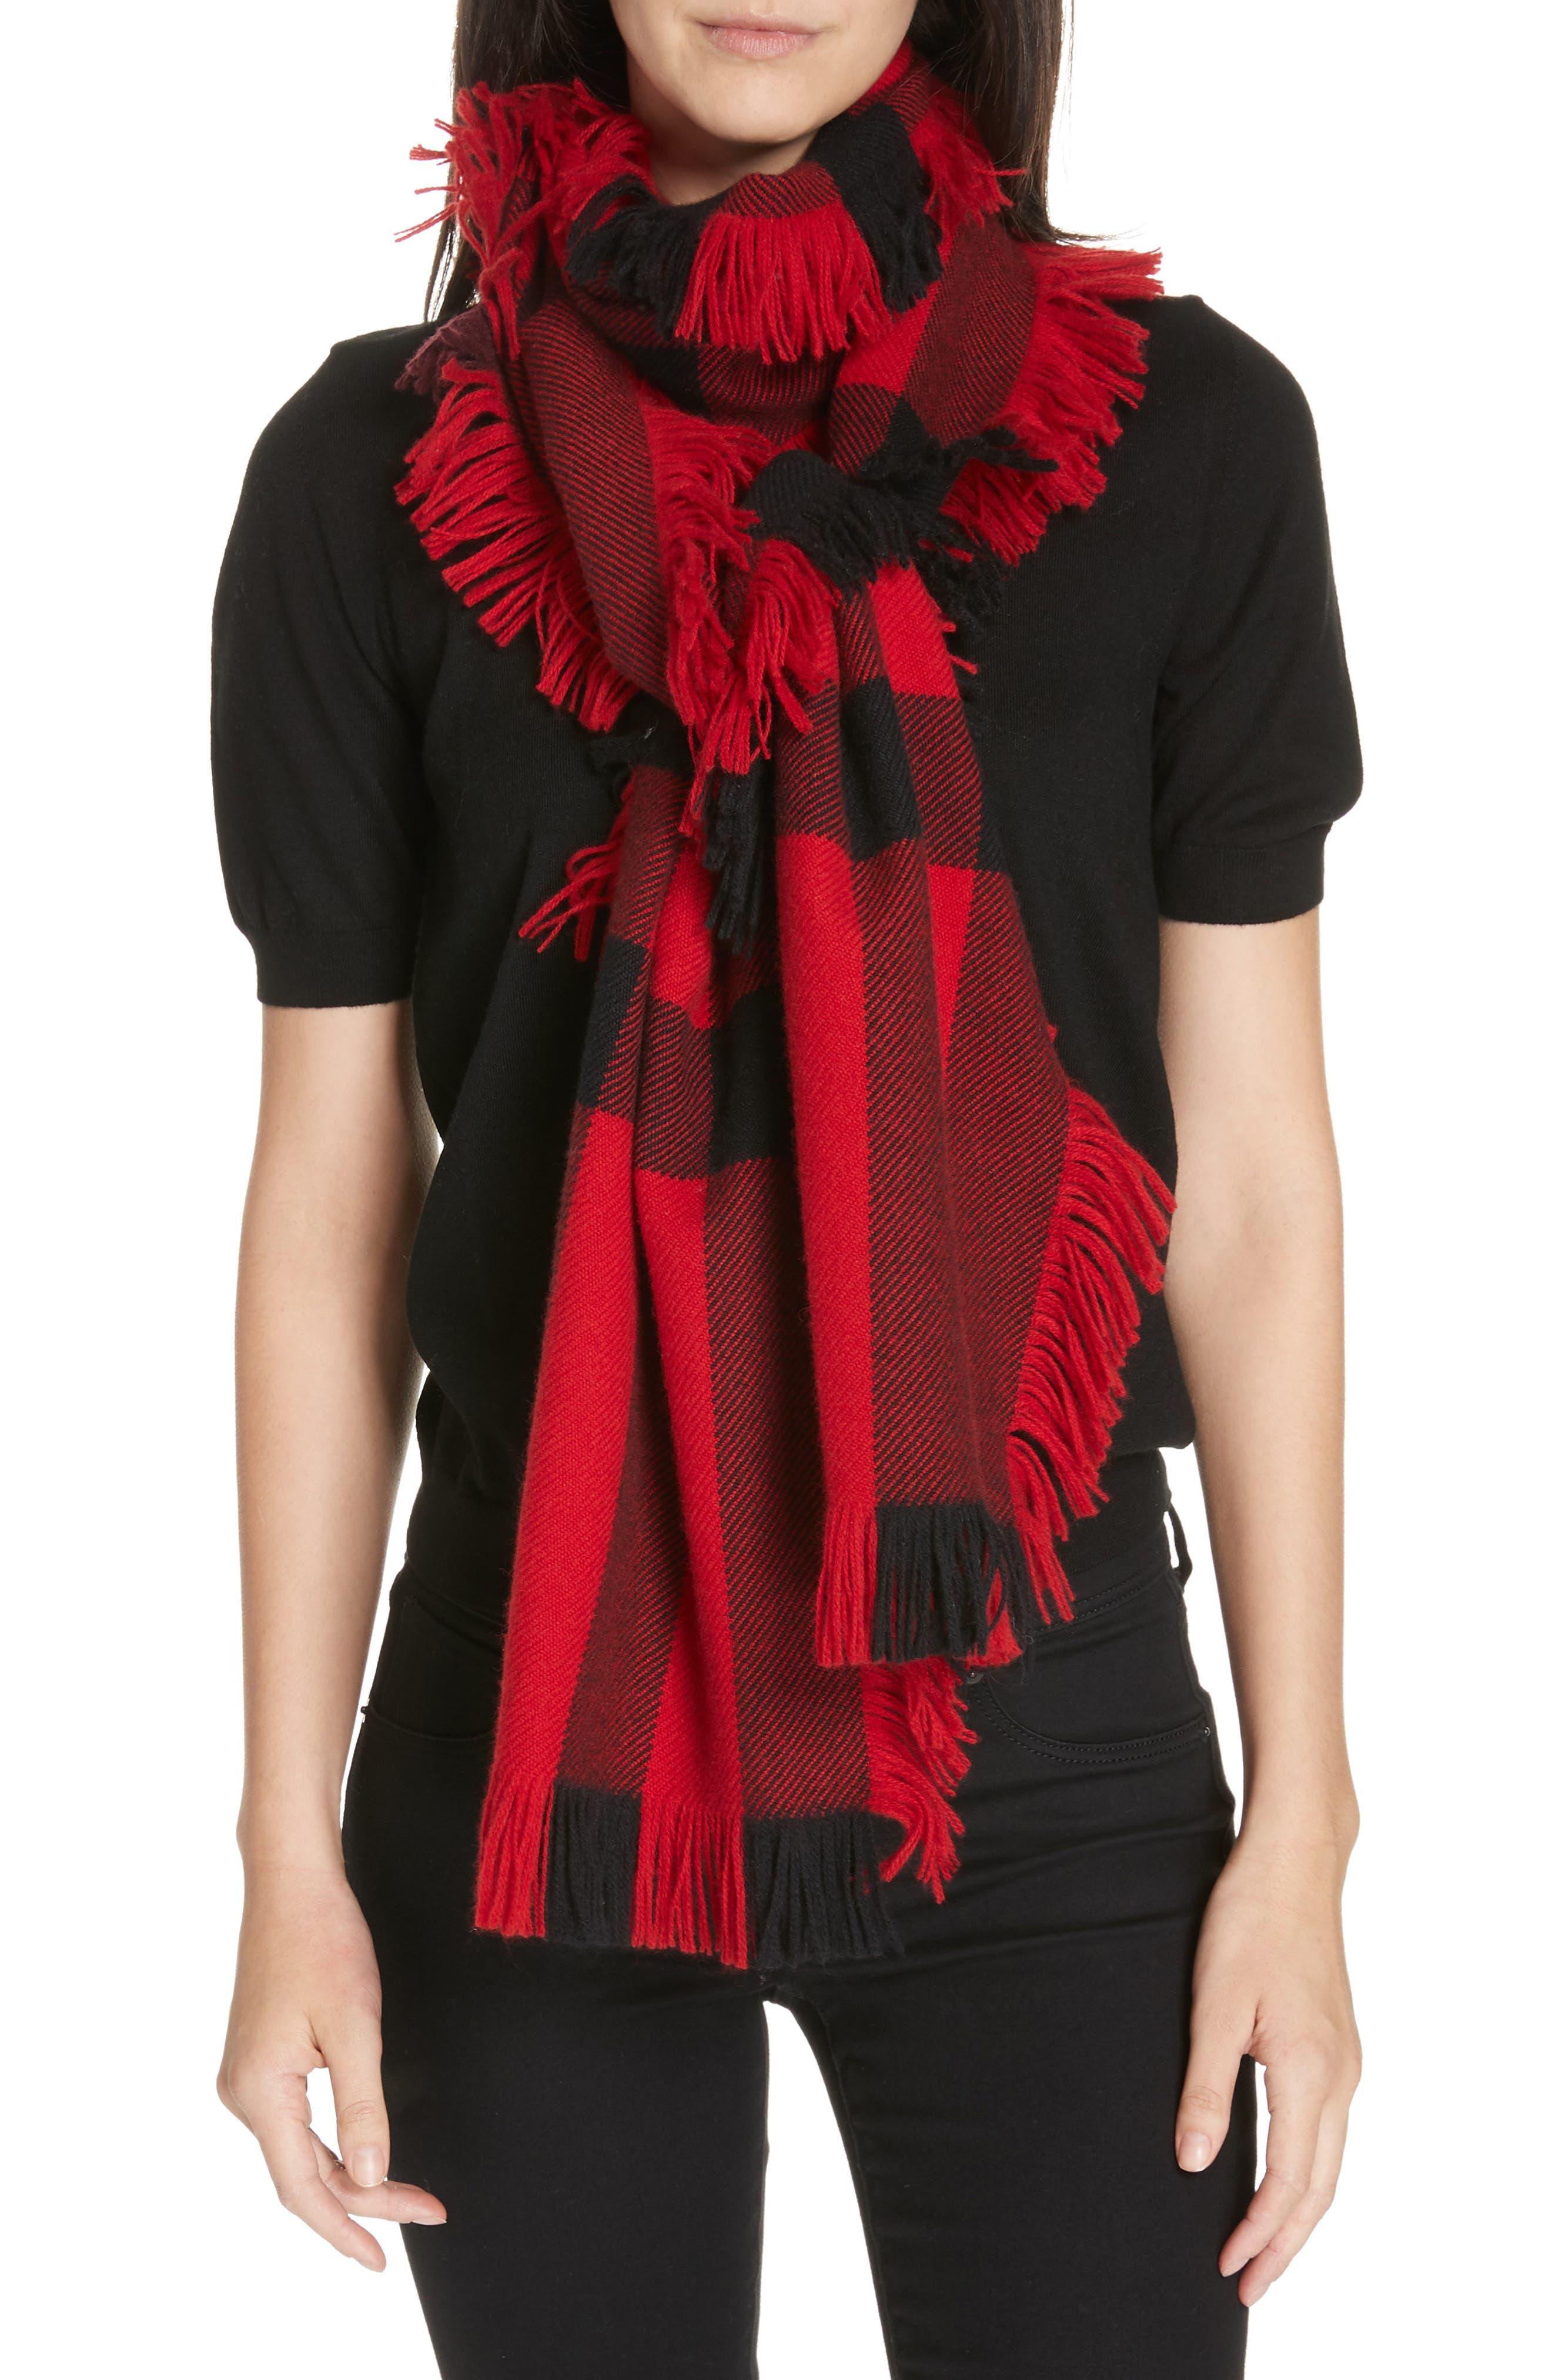 BURBERRY, Mega Fashion Fringe Wool Scarf, Alternate thumbnail 2, color, MILITARY RED